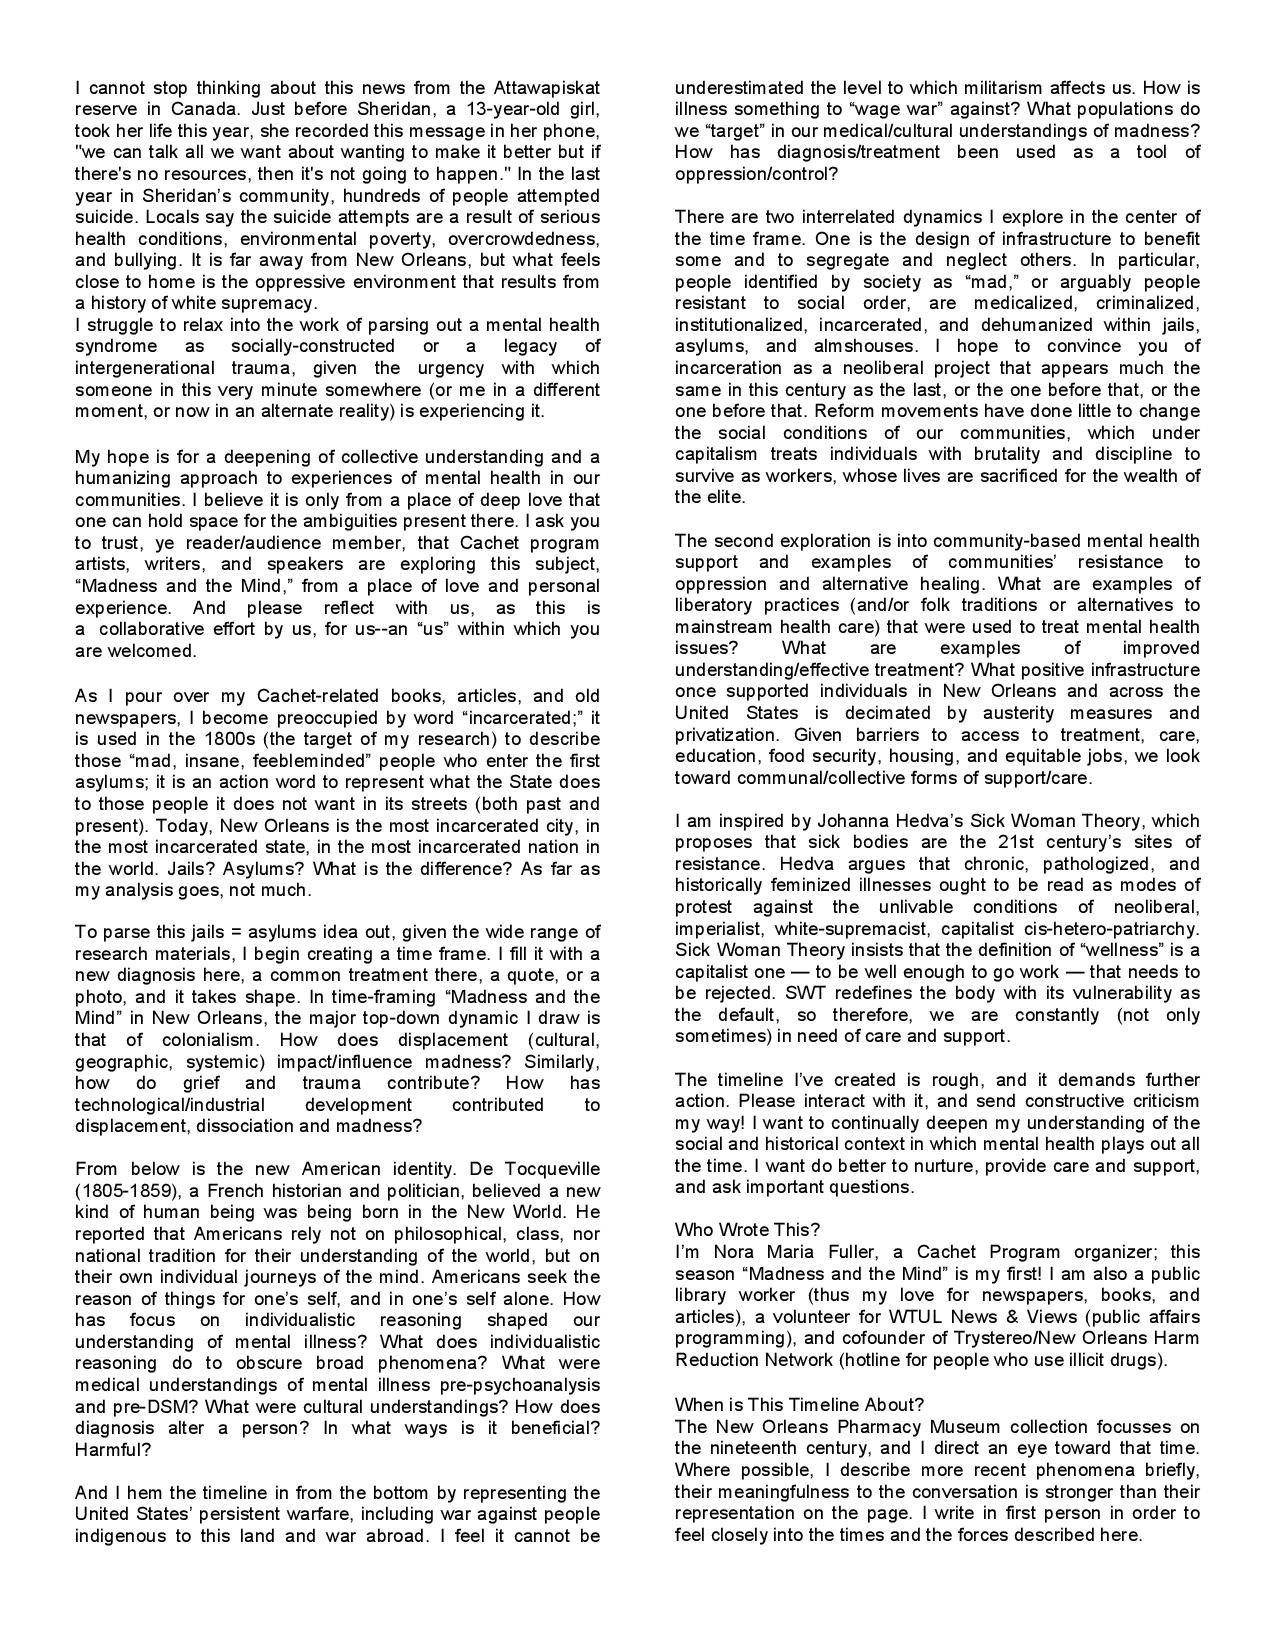 Timeline-page-002.jpg